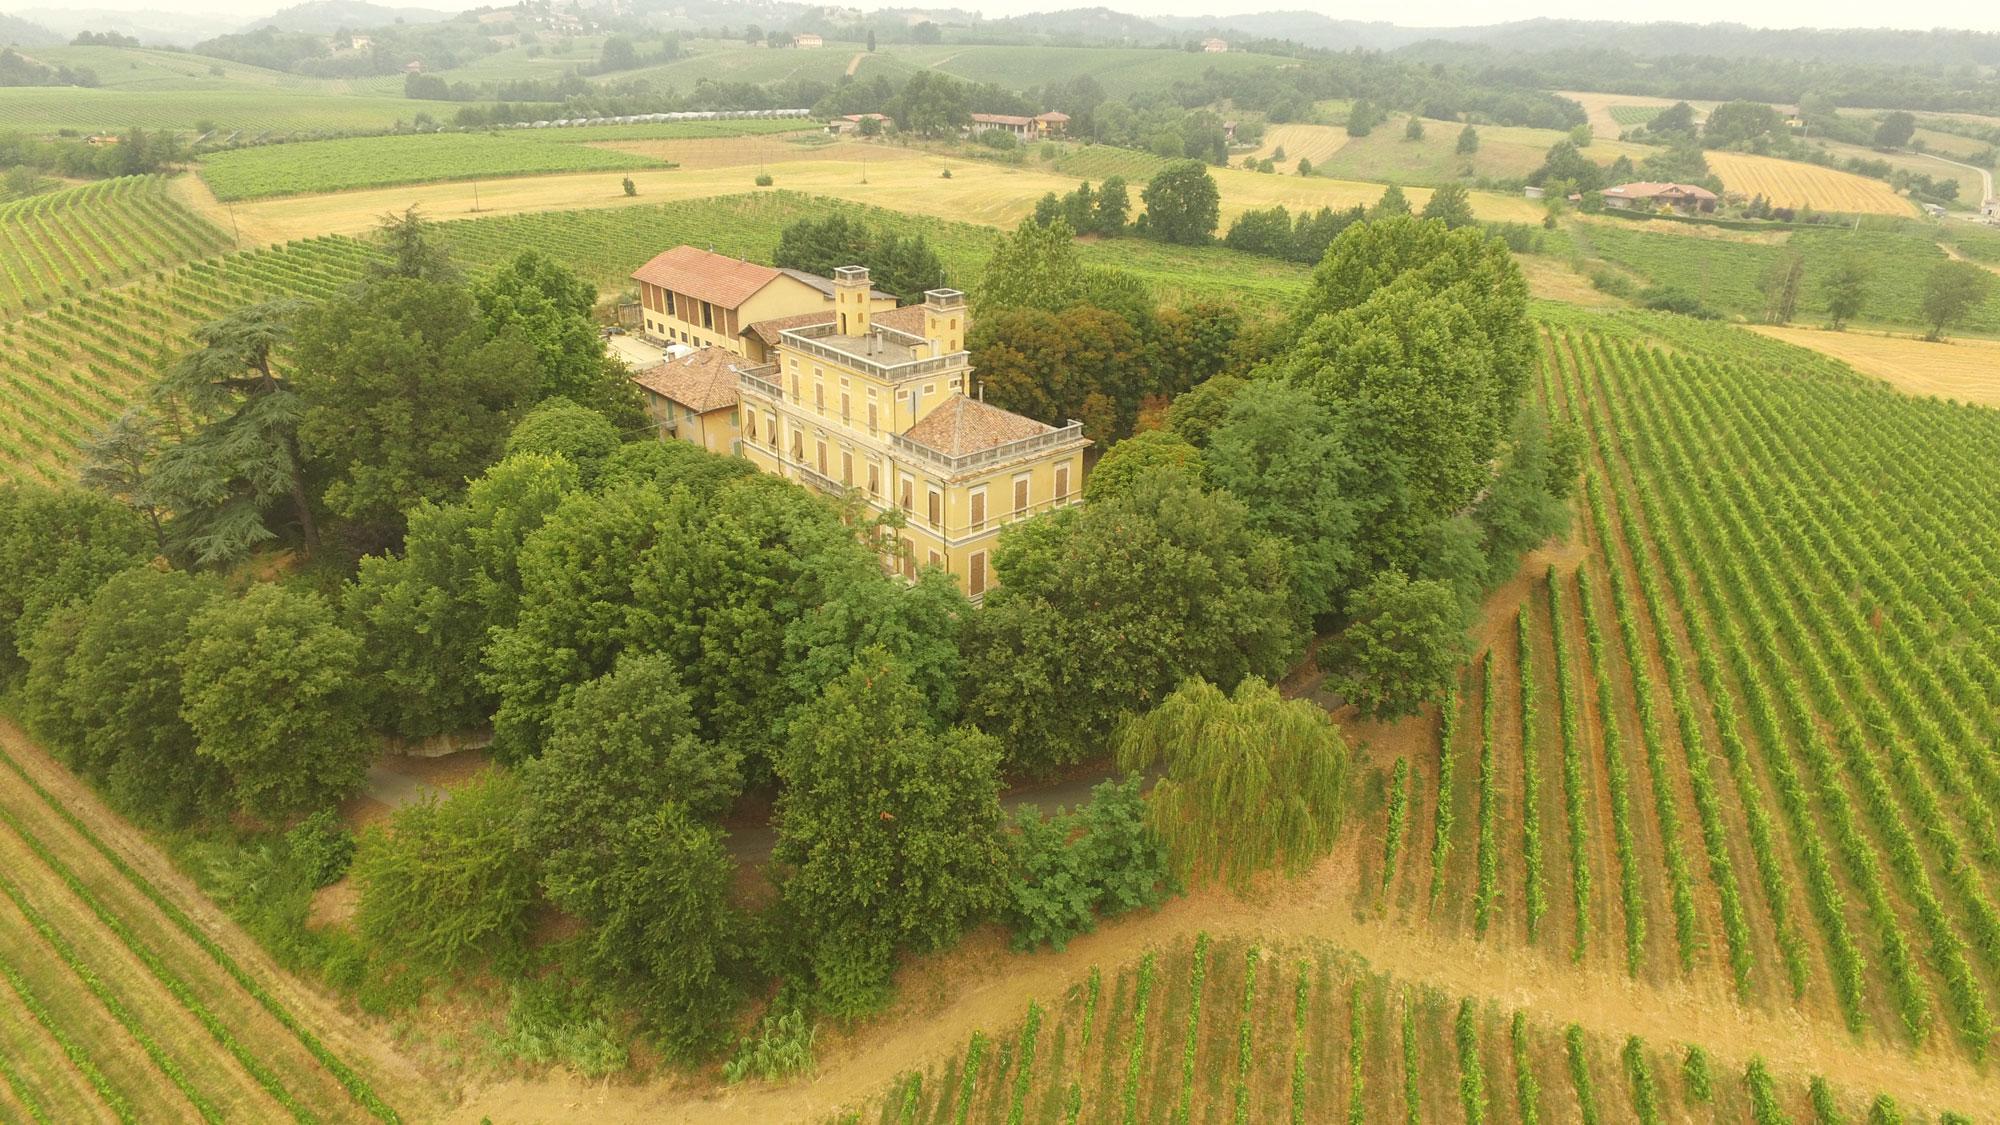 Winery Olim Bauda